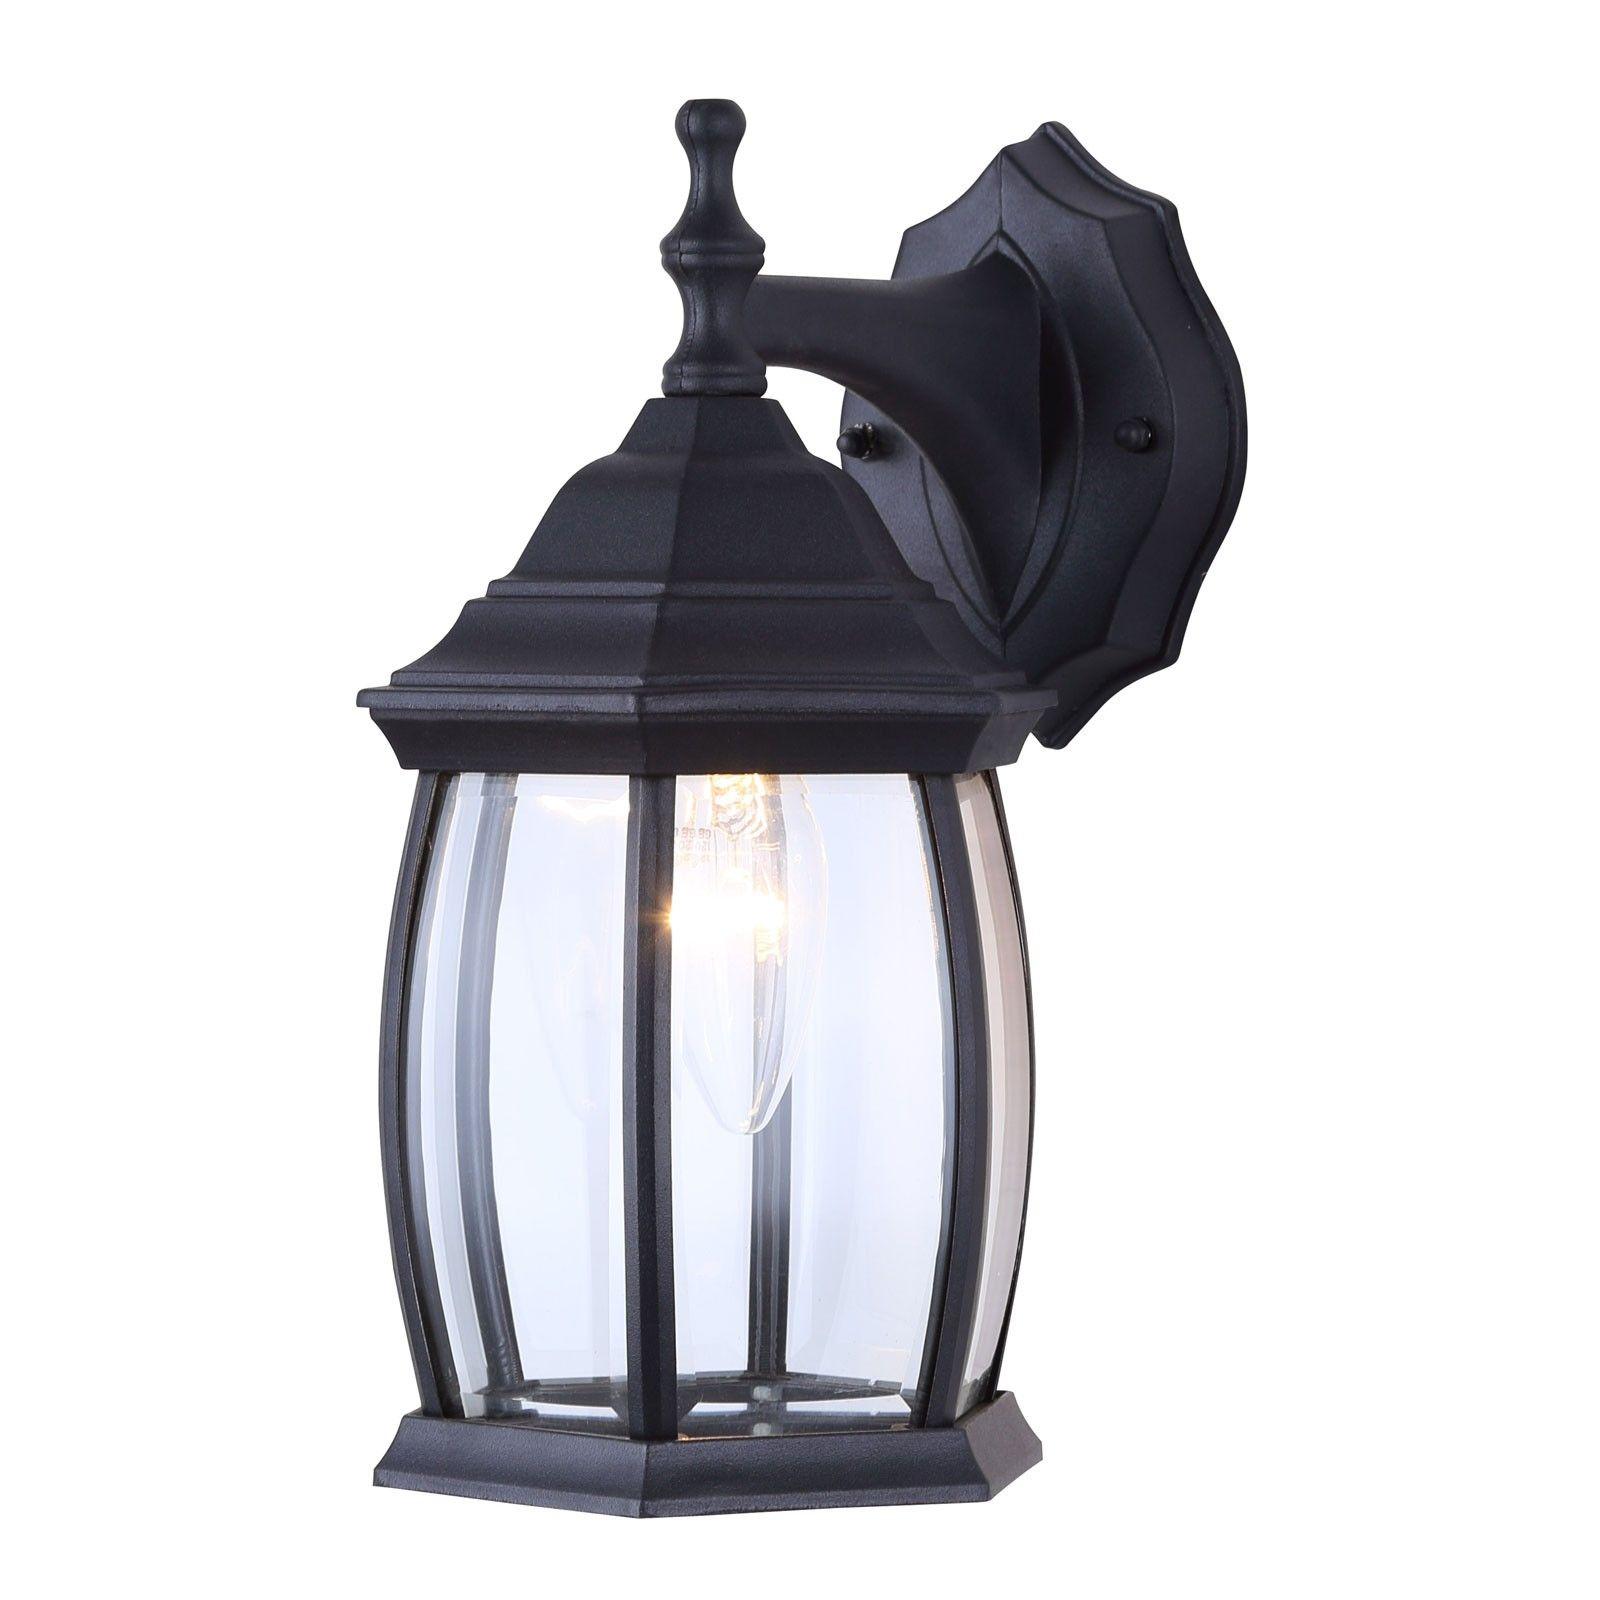 Canarm Iol12bk Exterior Lighting Lantern Wall Mount Sconce Light